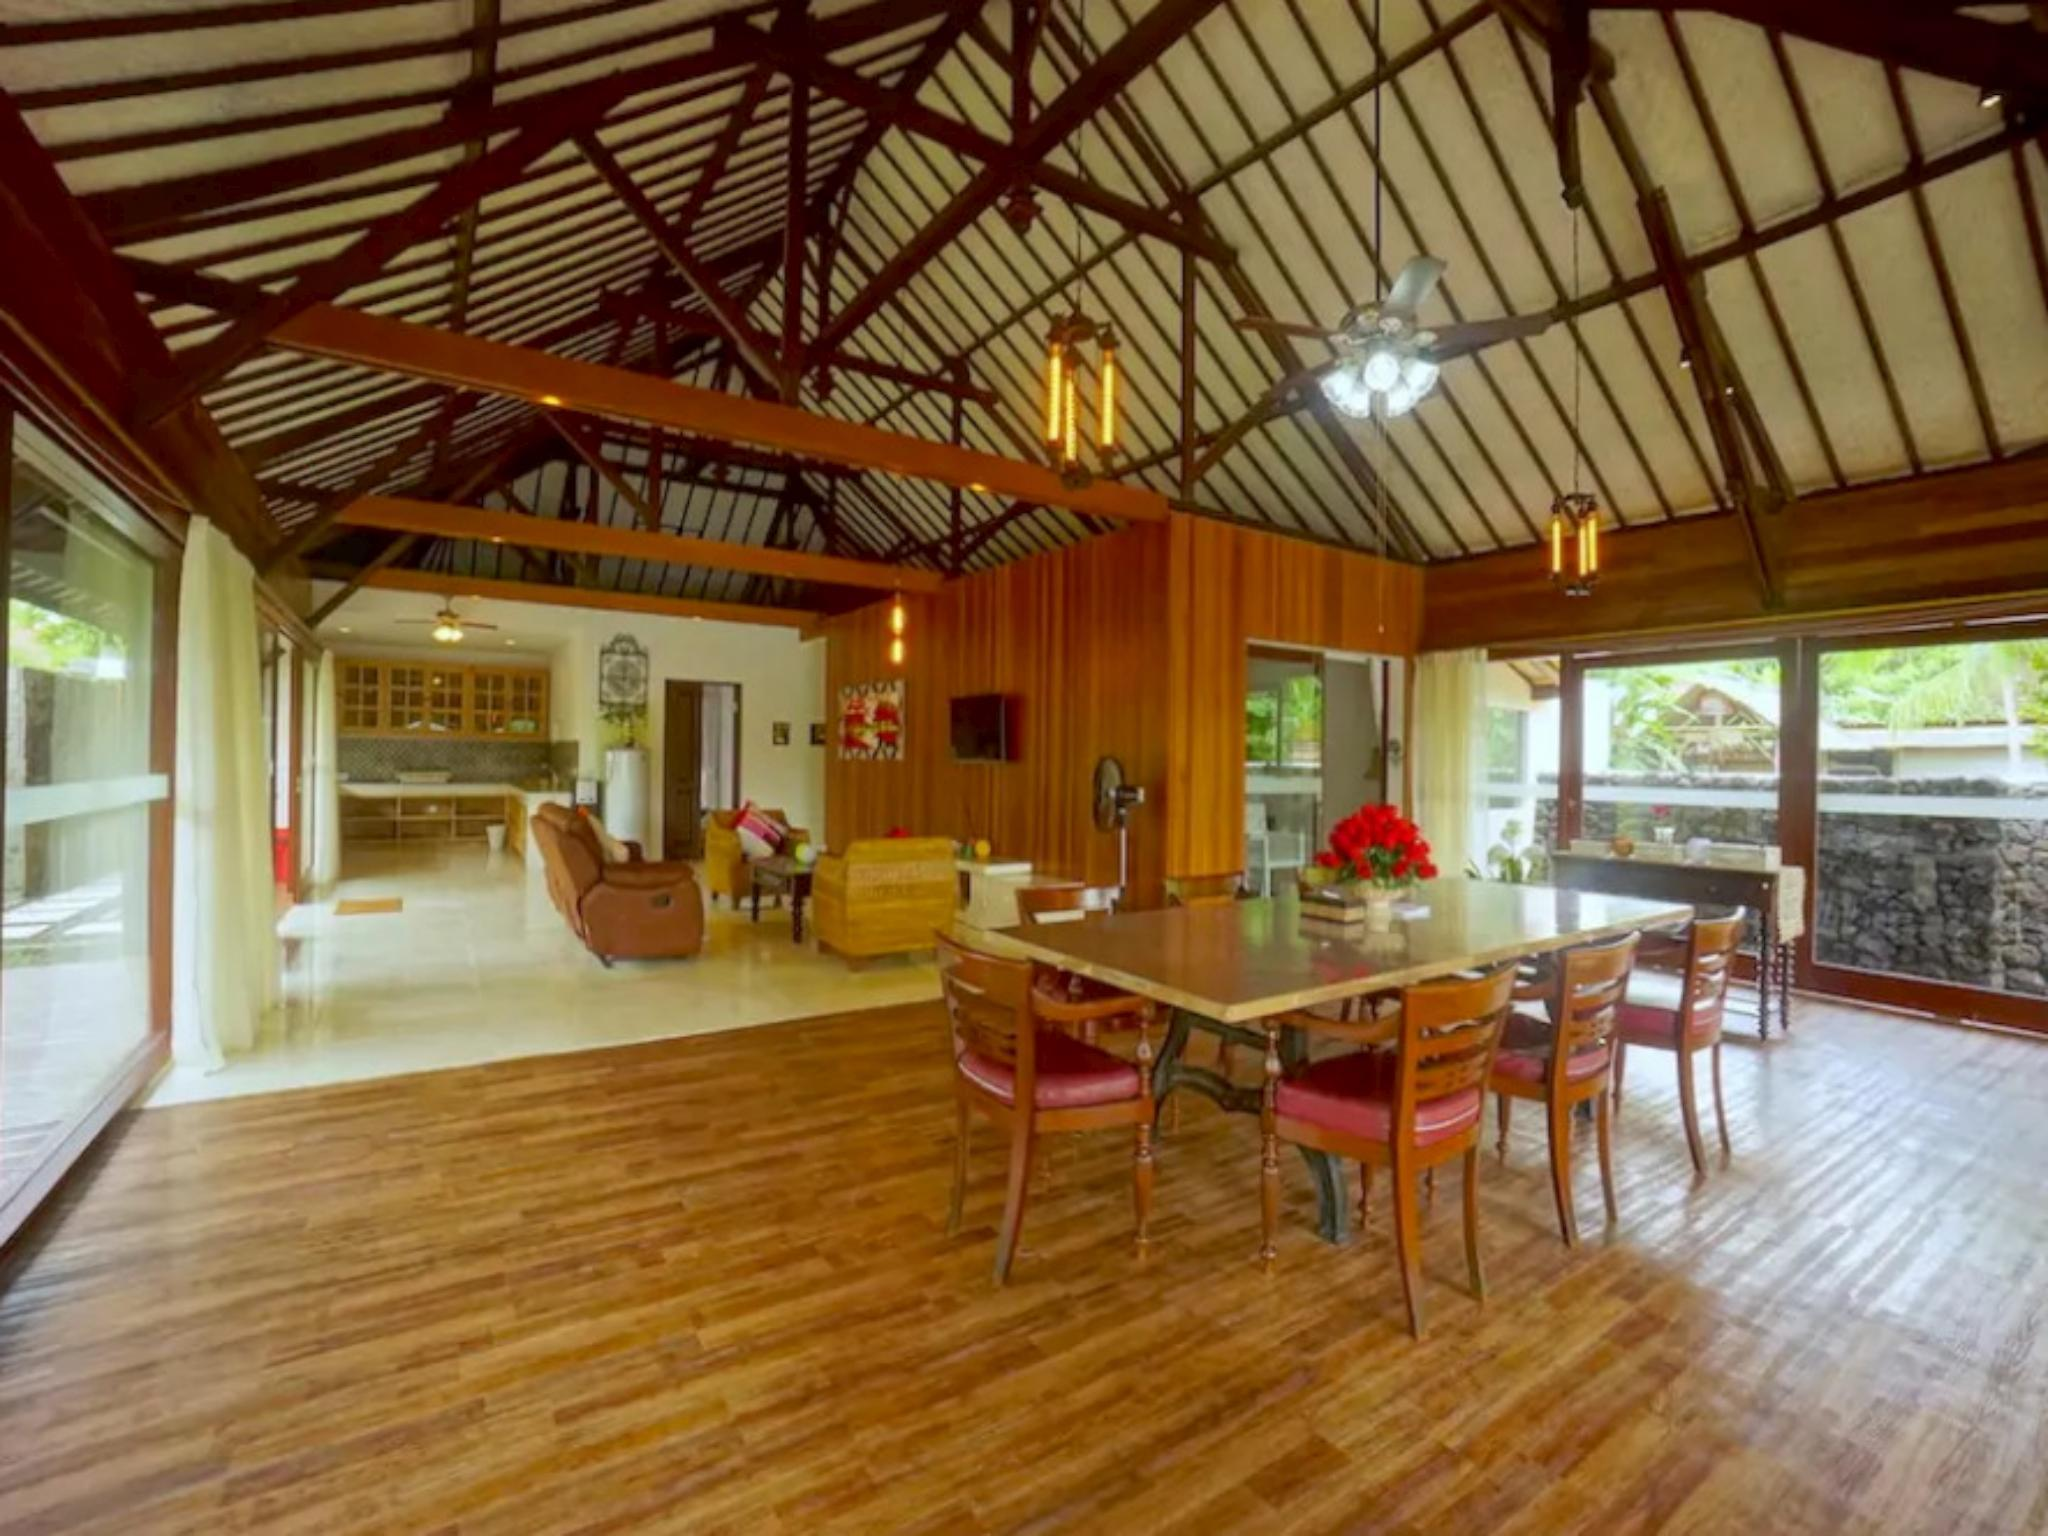 3BR Luxury Villa In The Heart Of Ubud